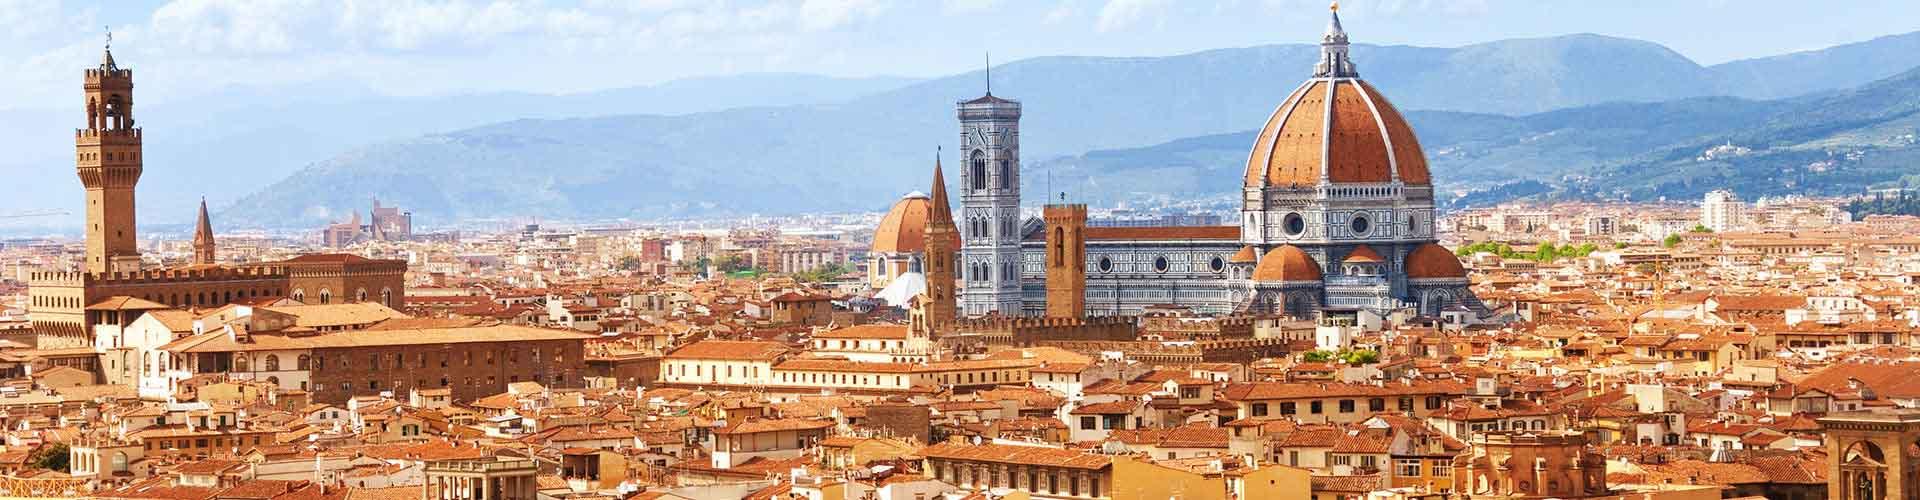 Florence - Camping dans le quartier de Giardino de Boboli. Cartes pour Florence, photos et commentaires pour chaque camping à Florence.